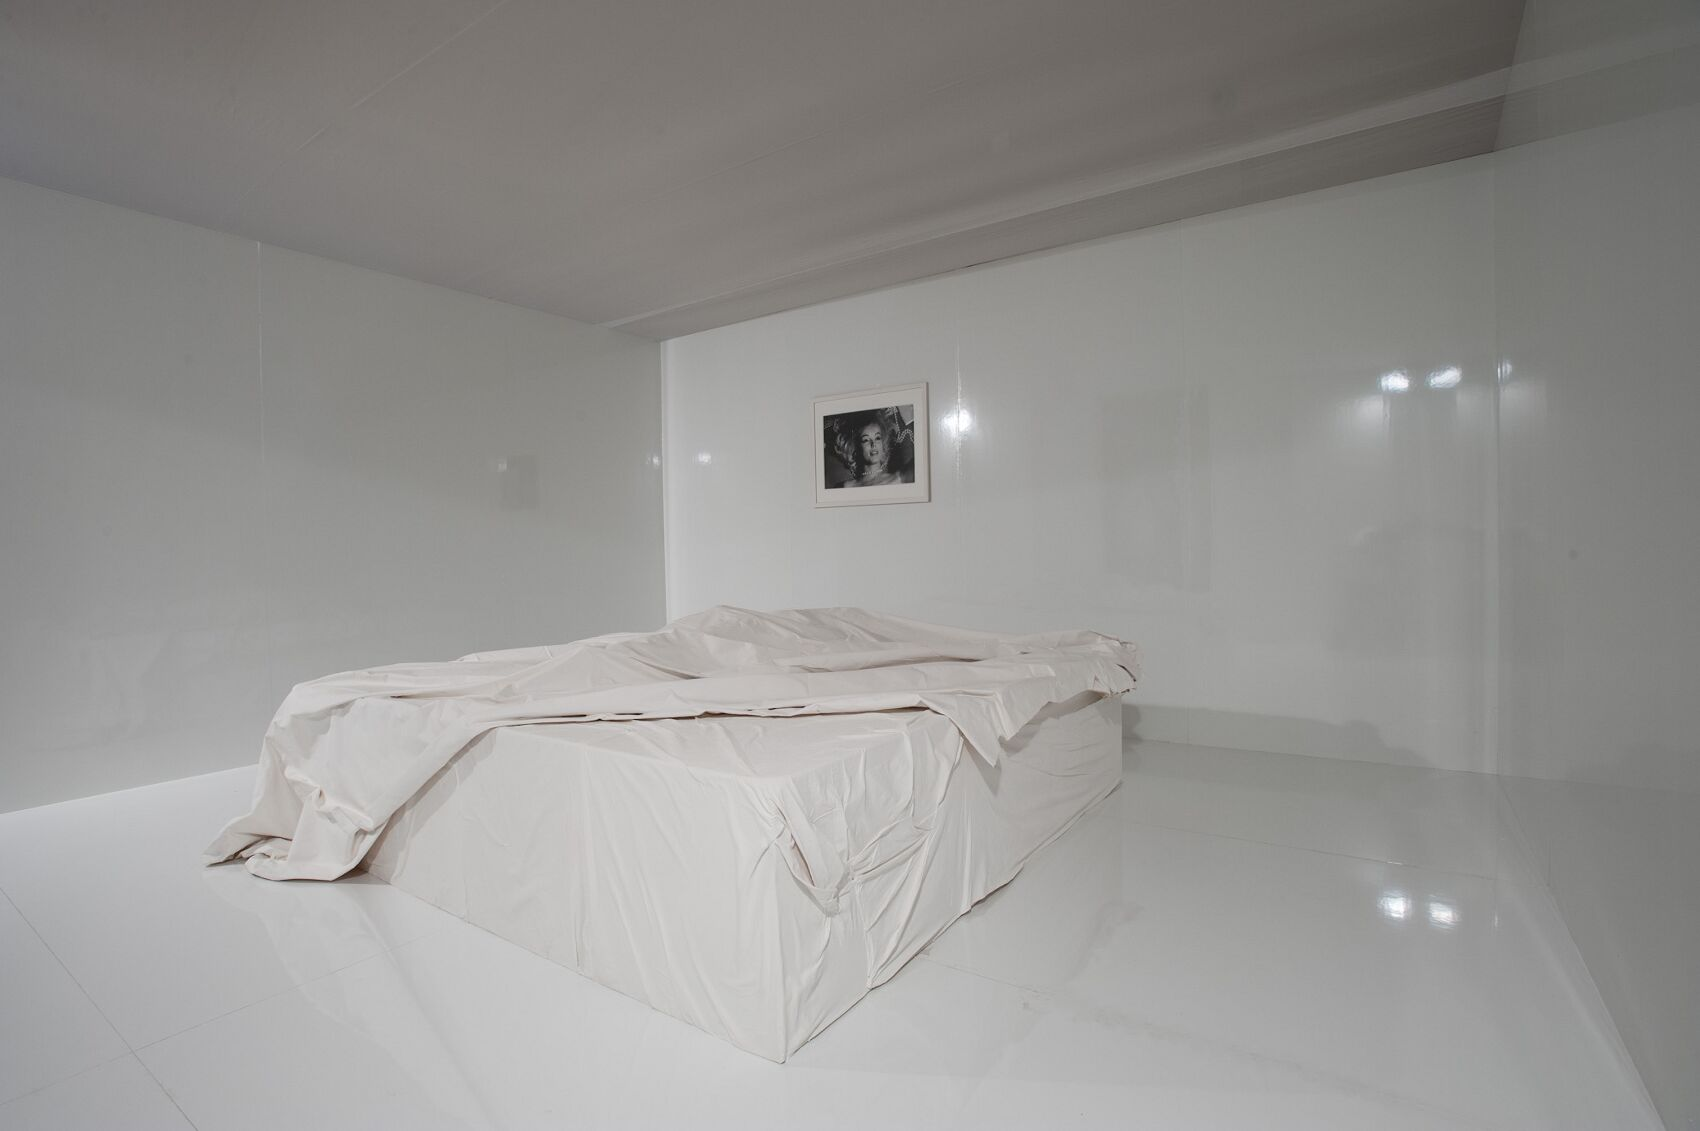 Marilyn Monroe Bed Salvatore Ferragamo Museum